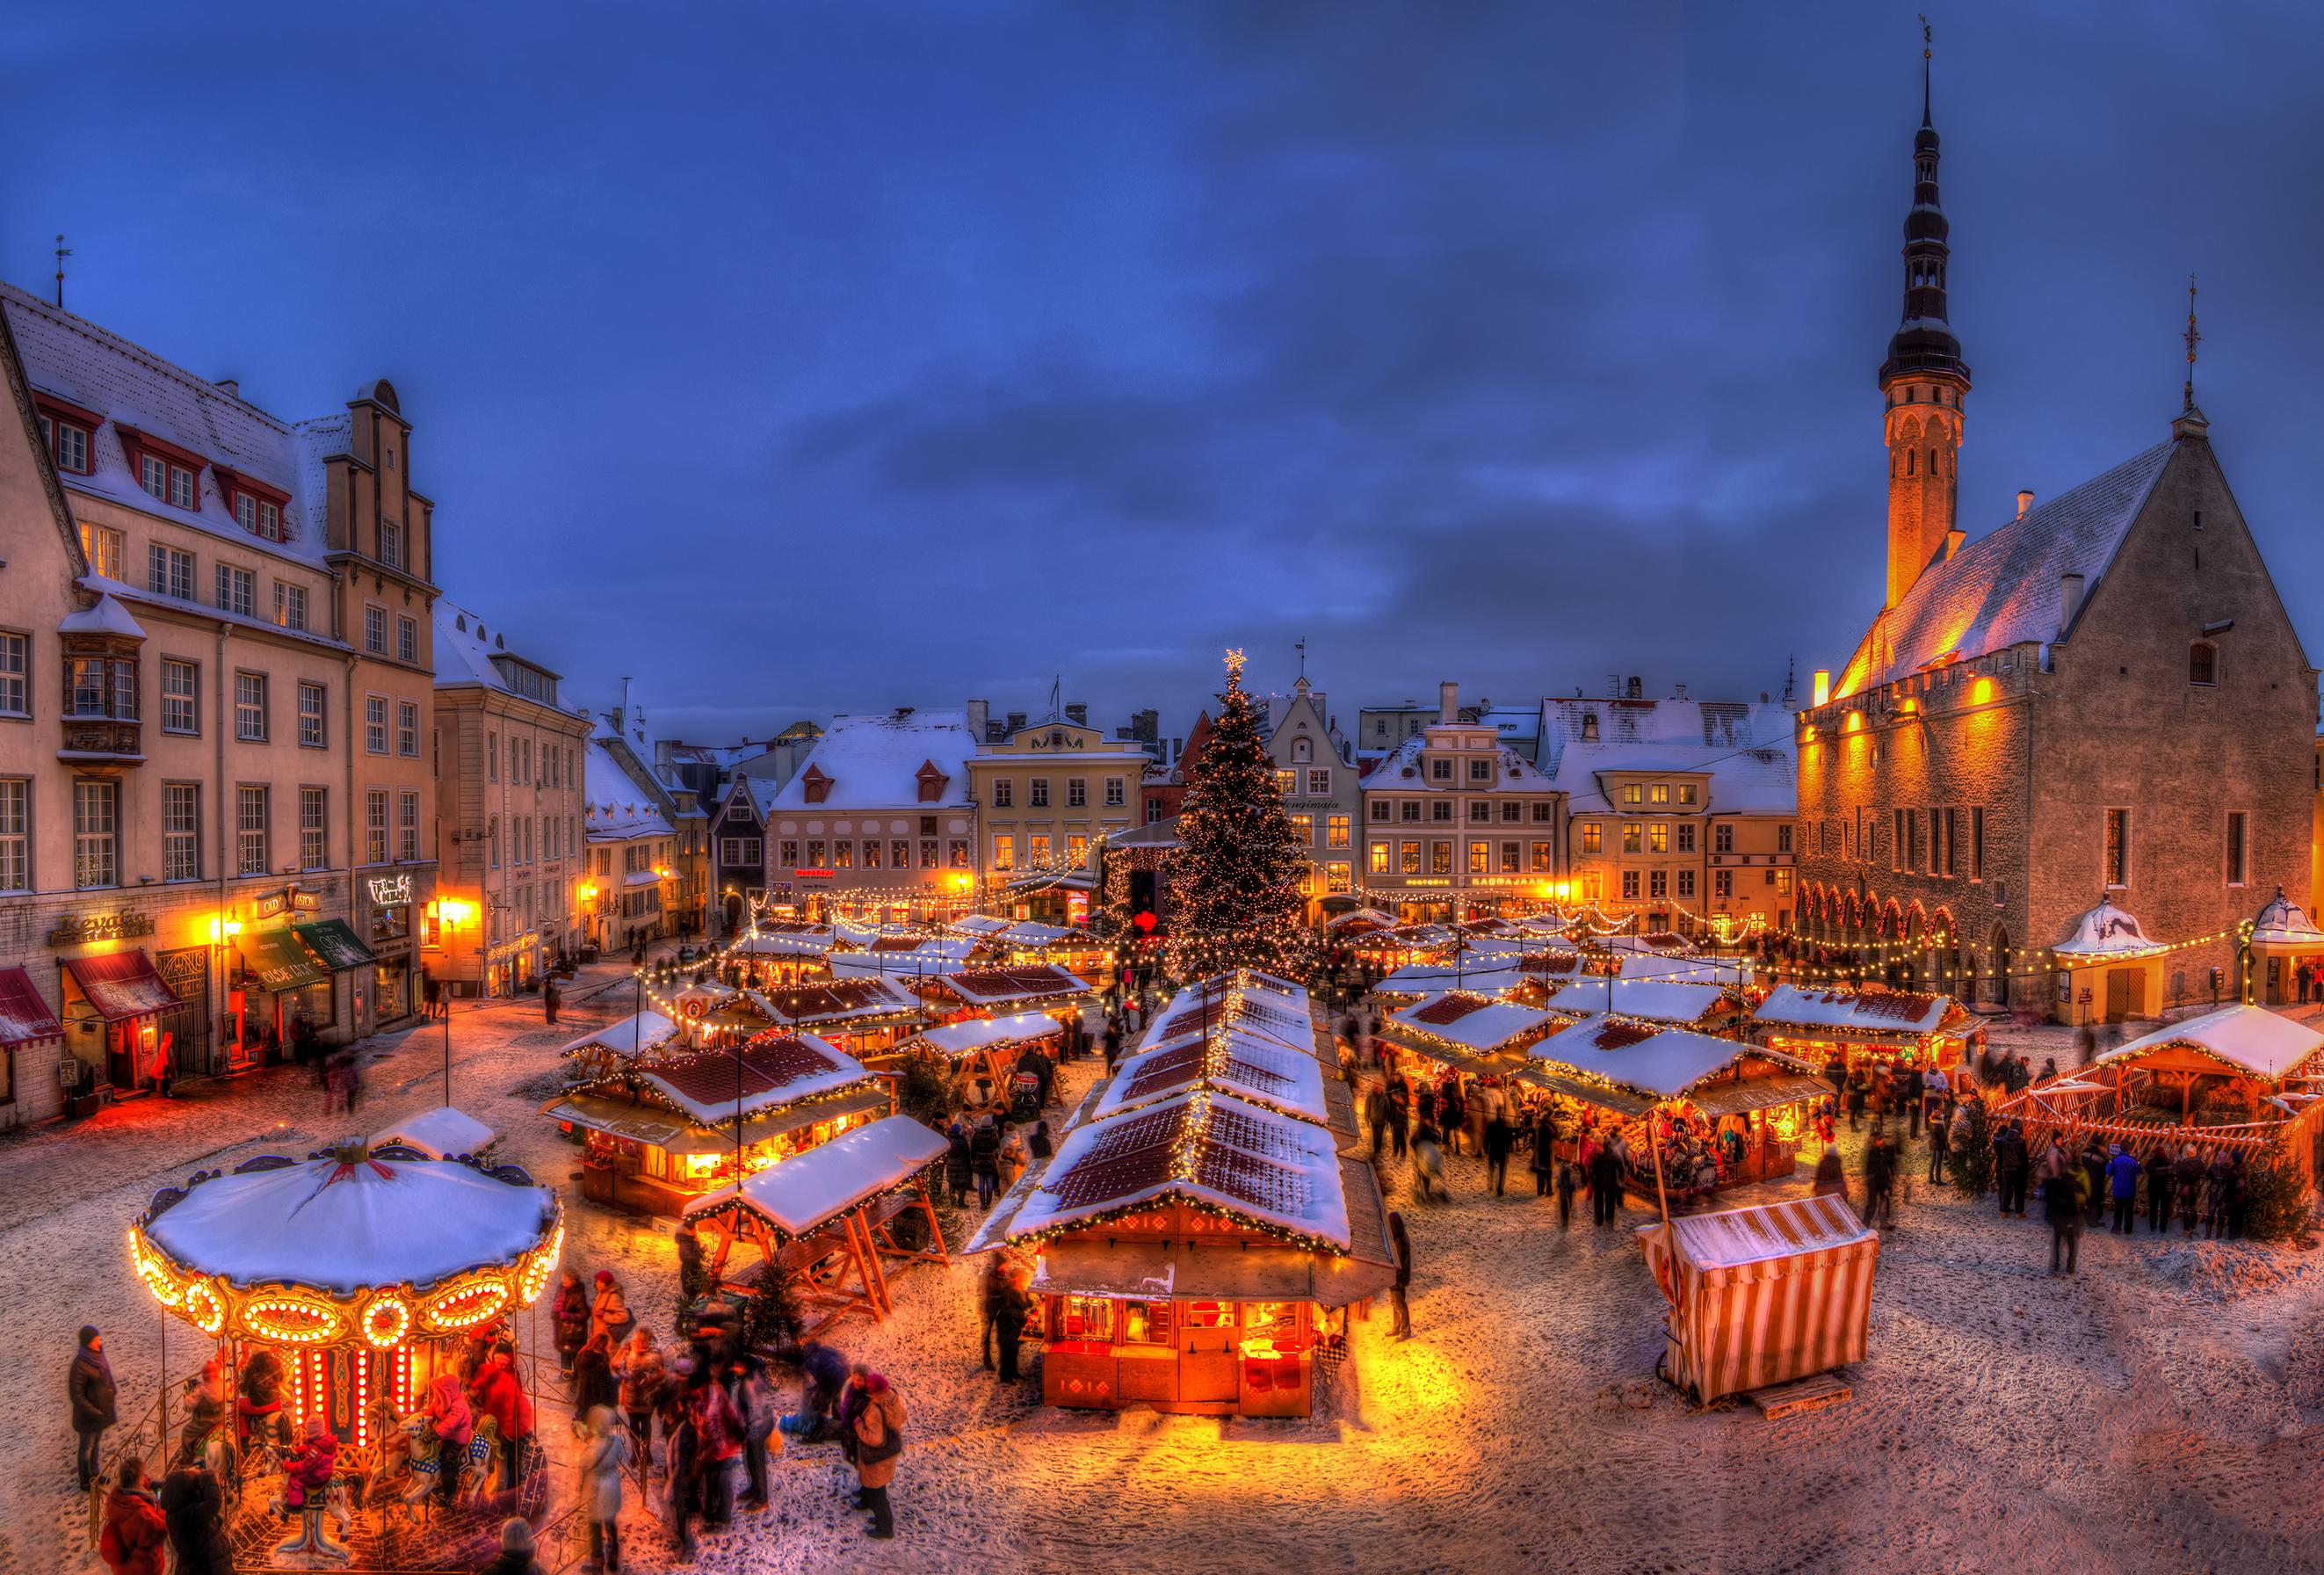 Kerstmarkt in Tallinn, Estland